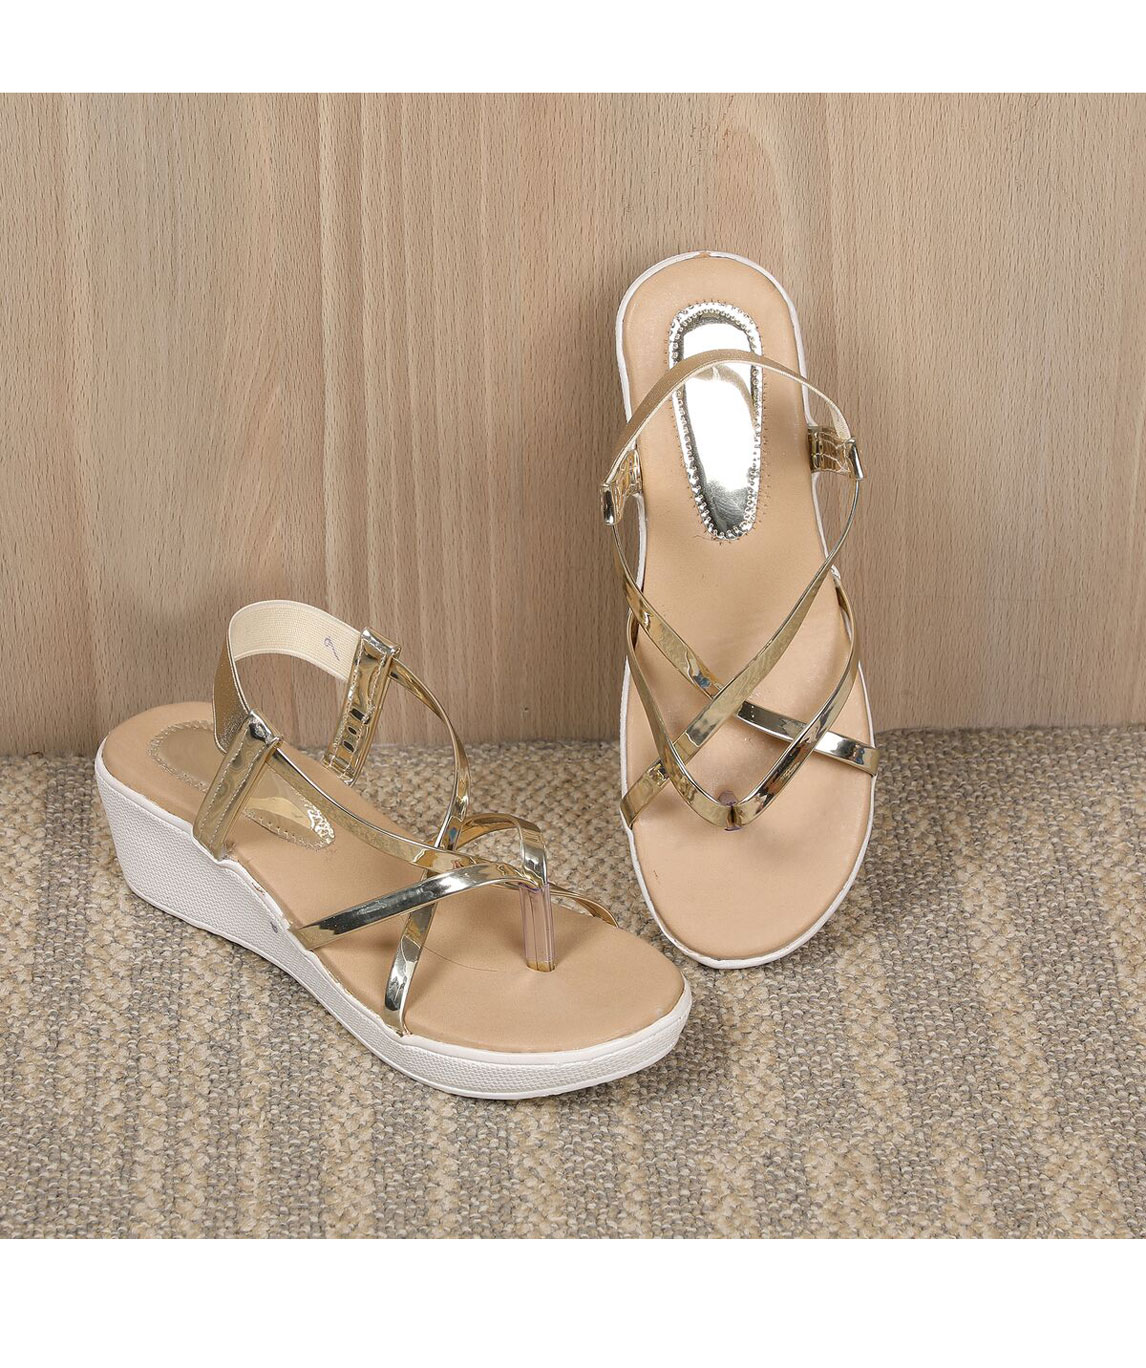 Sindhi Footwear Women`s Golden Synthetic Leather Sandals